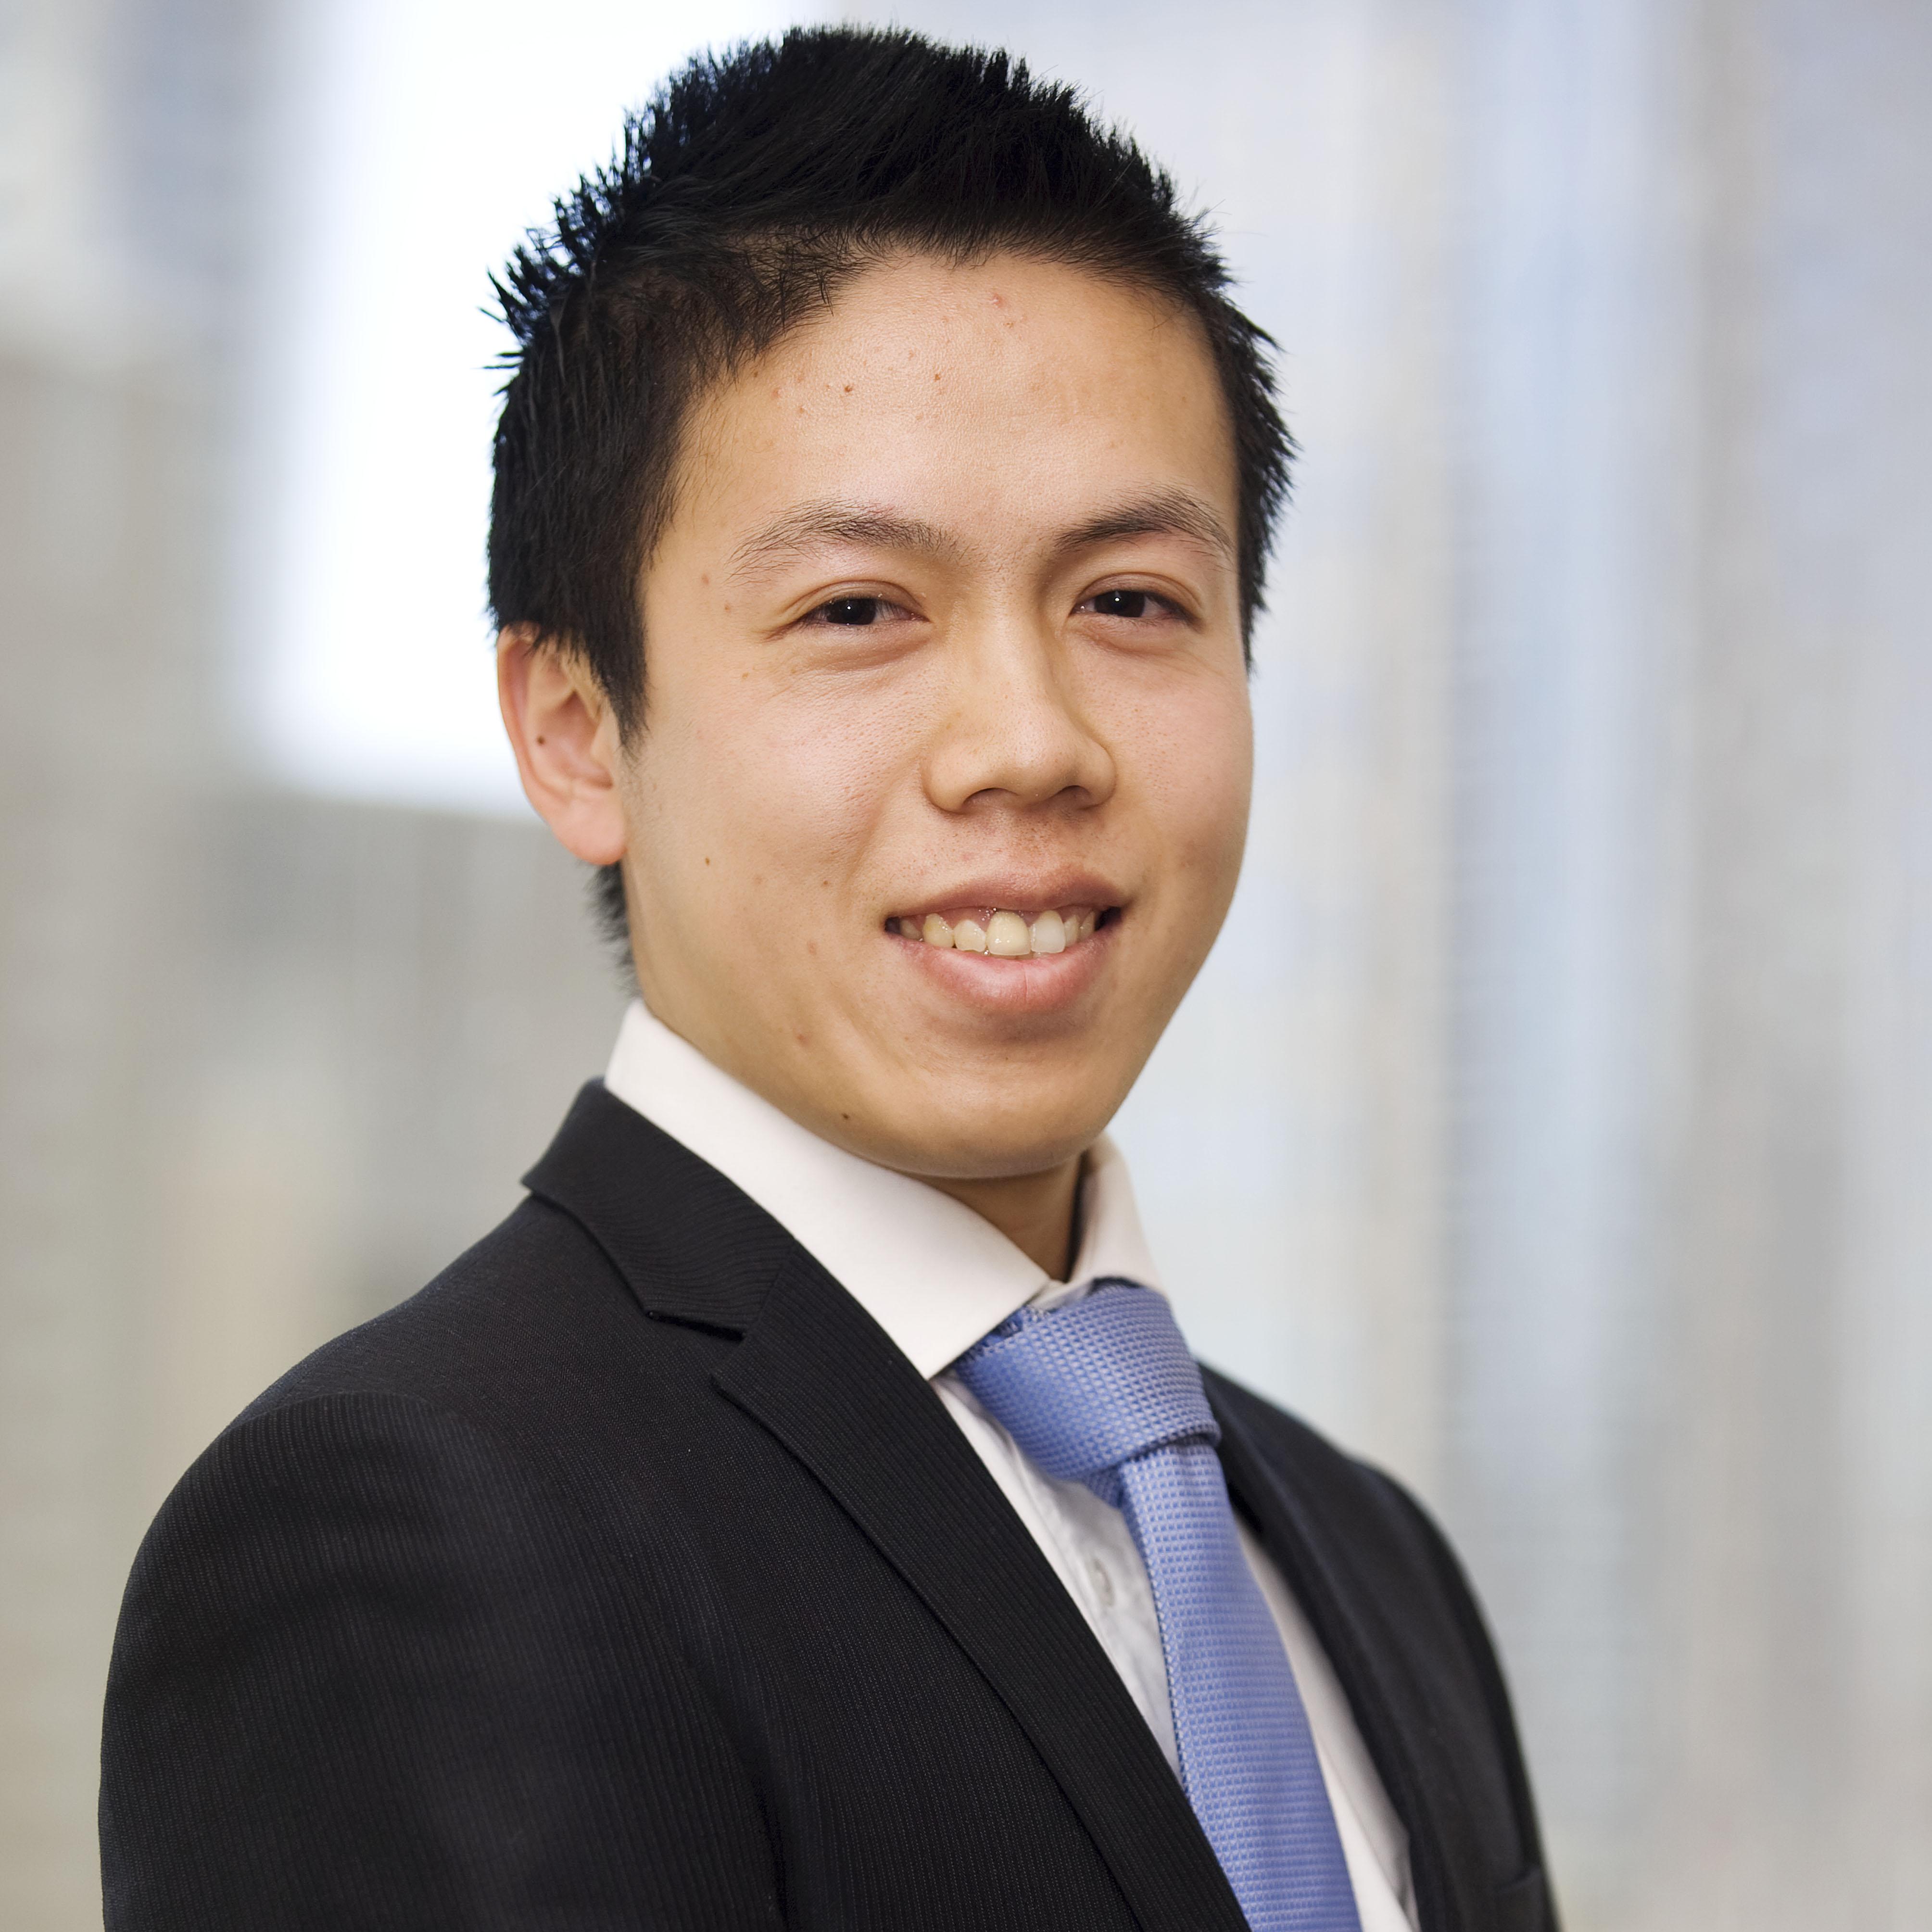 David Zhou